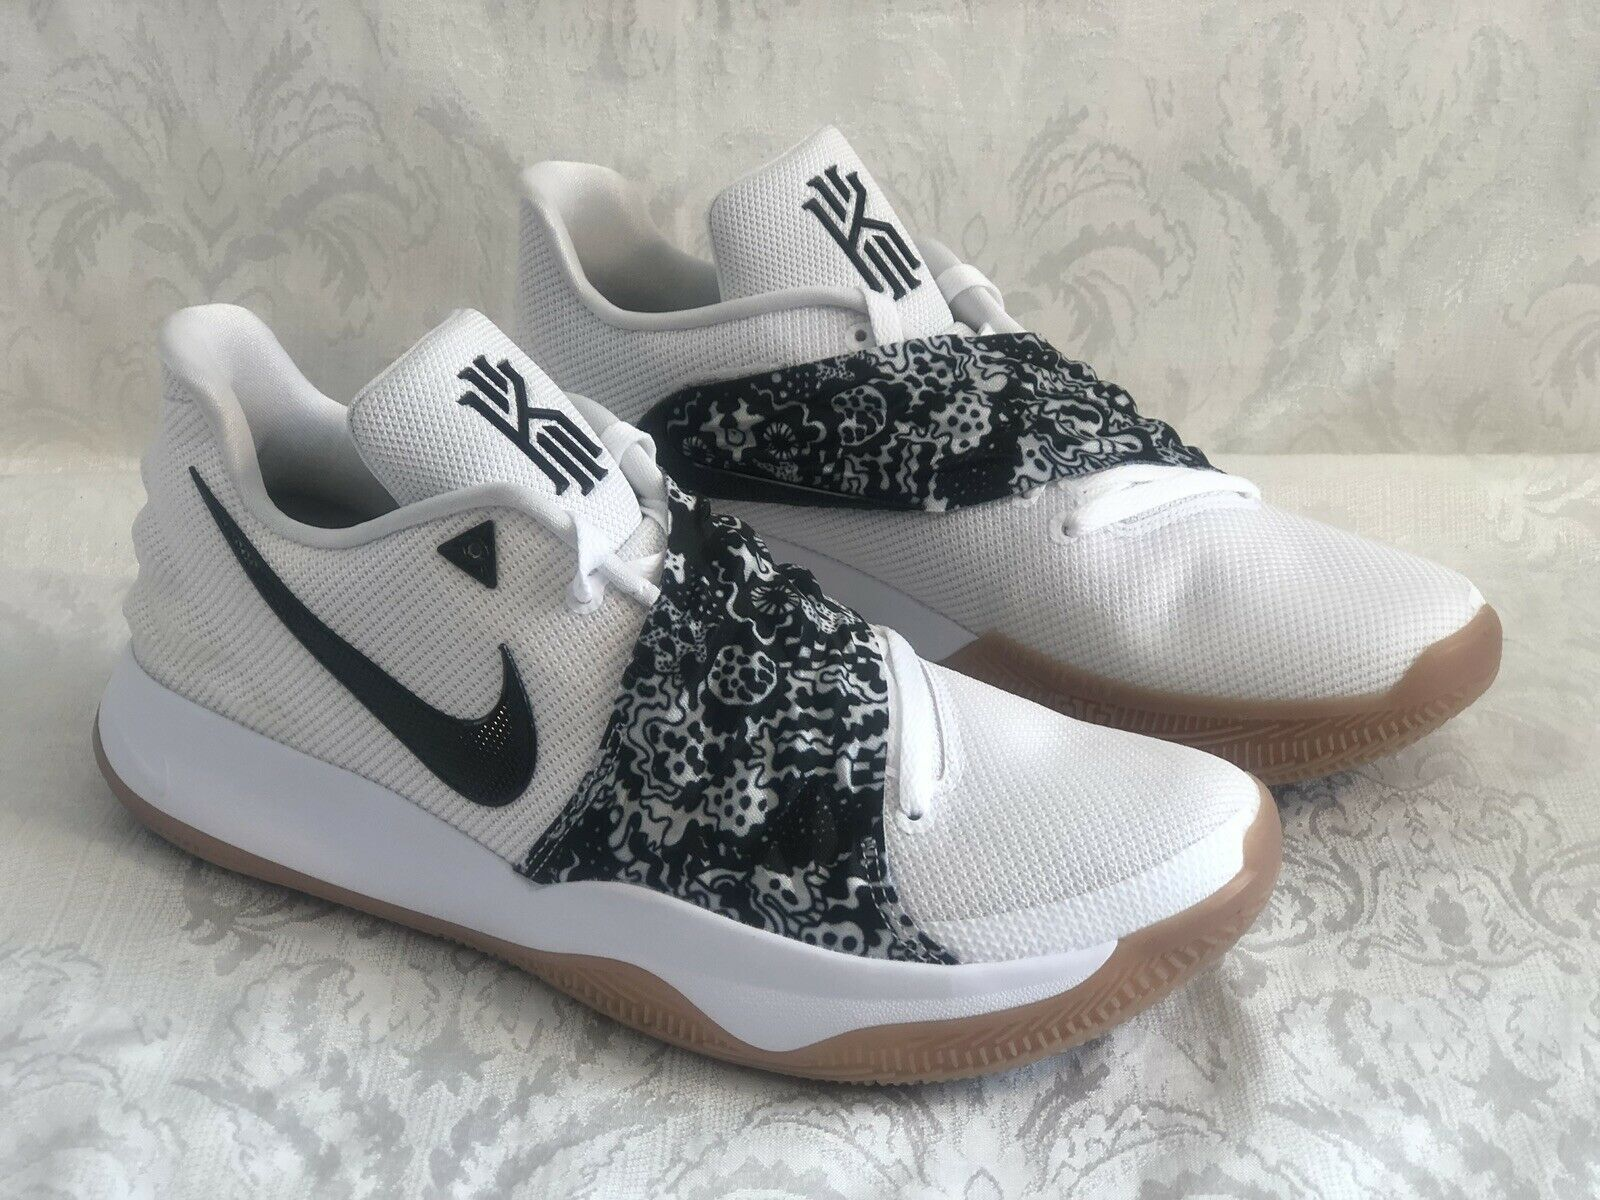 04e6f52854fe New Size 13.5 Men s Nike Kyrie 4 Low AO8979-100 White White White Black Gum